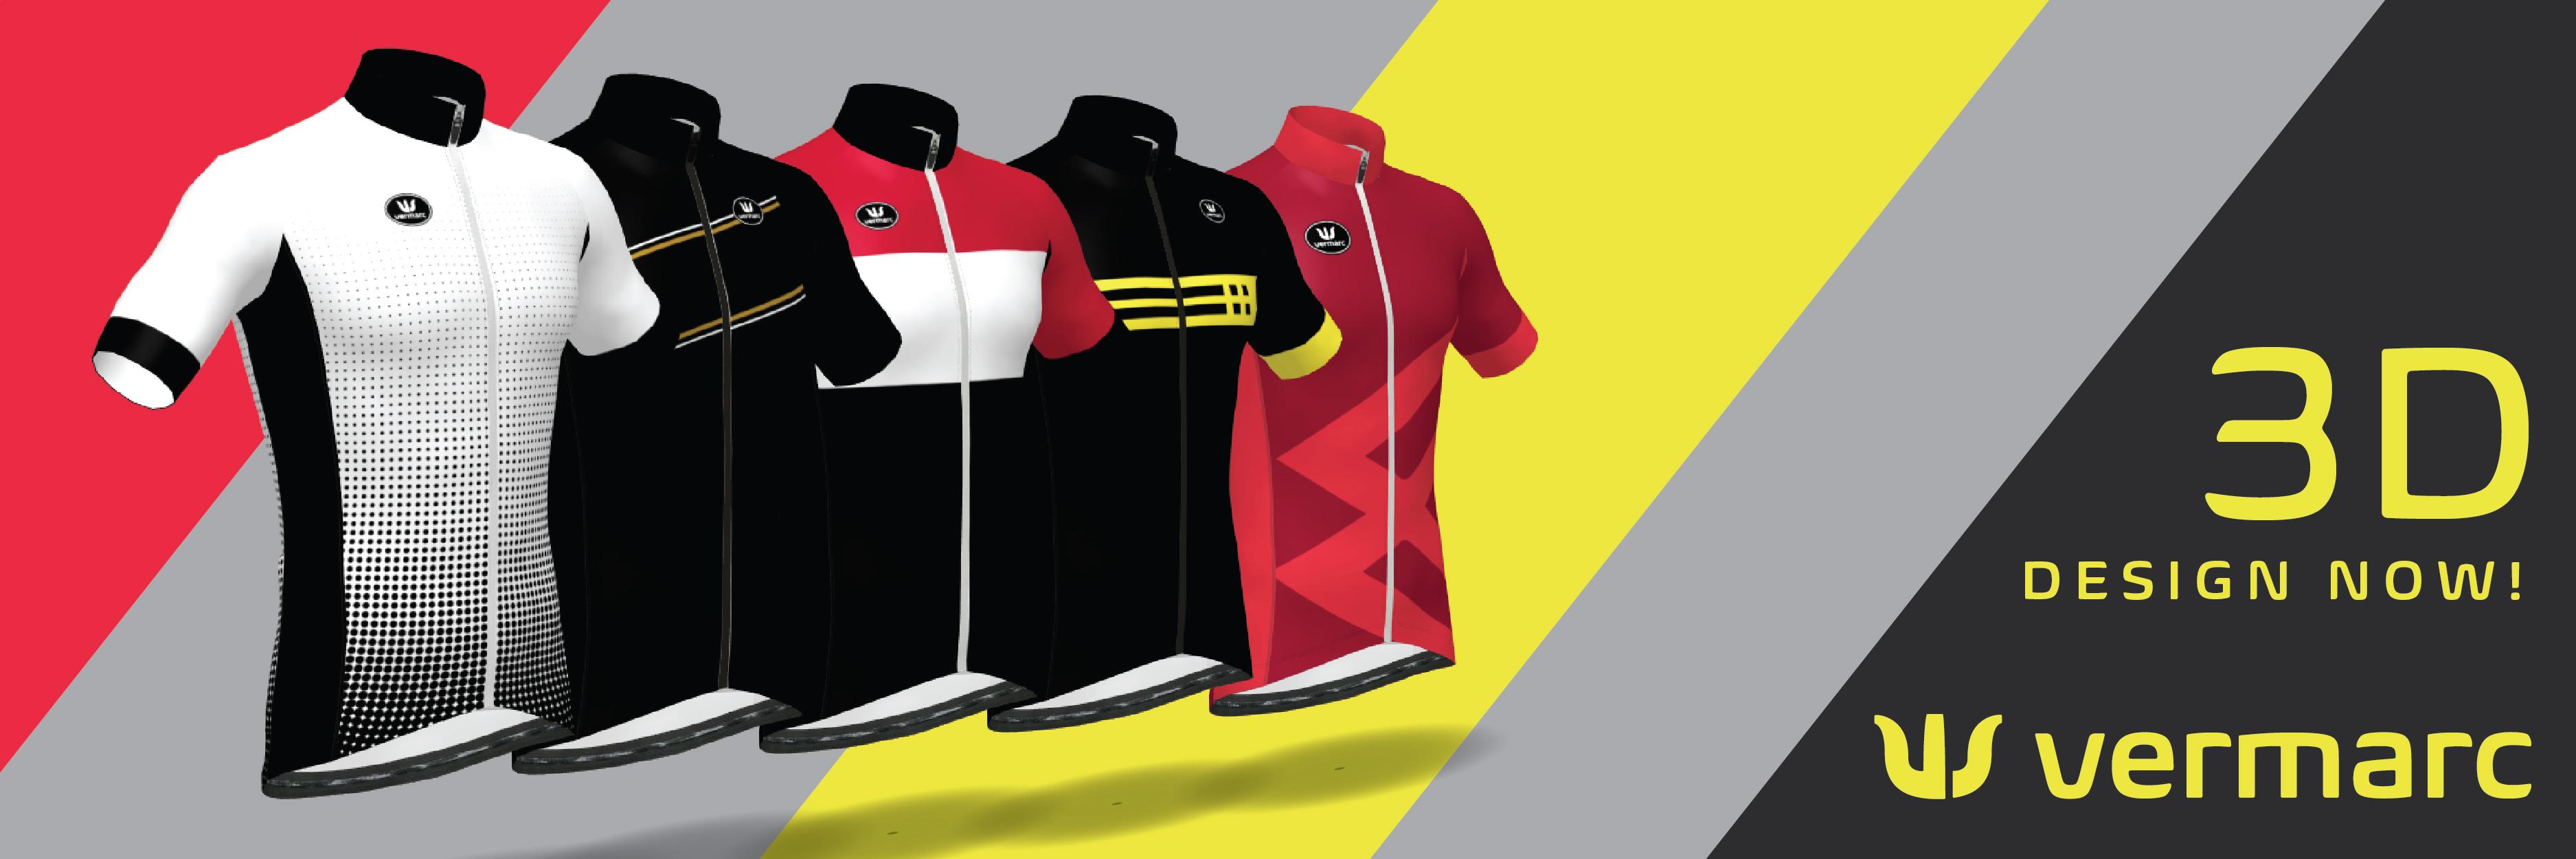 www.vermarcsport.com/nl/design-your-own-customteamwear